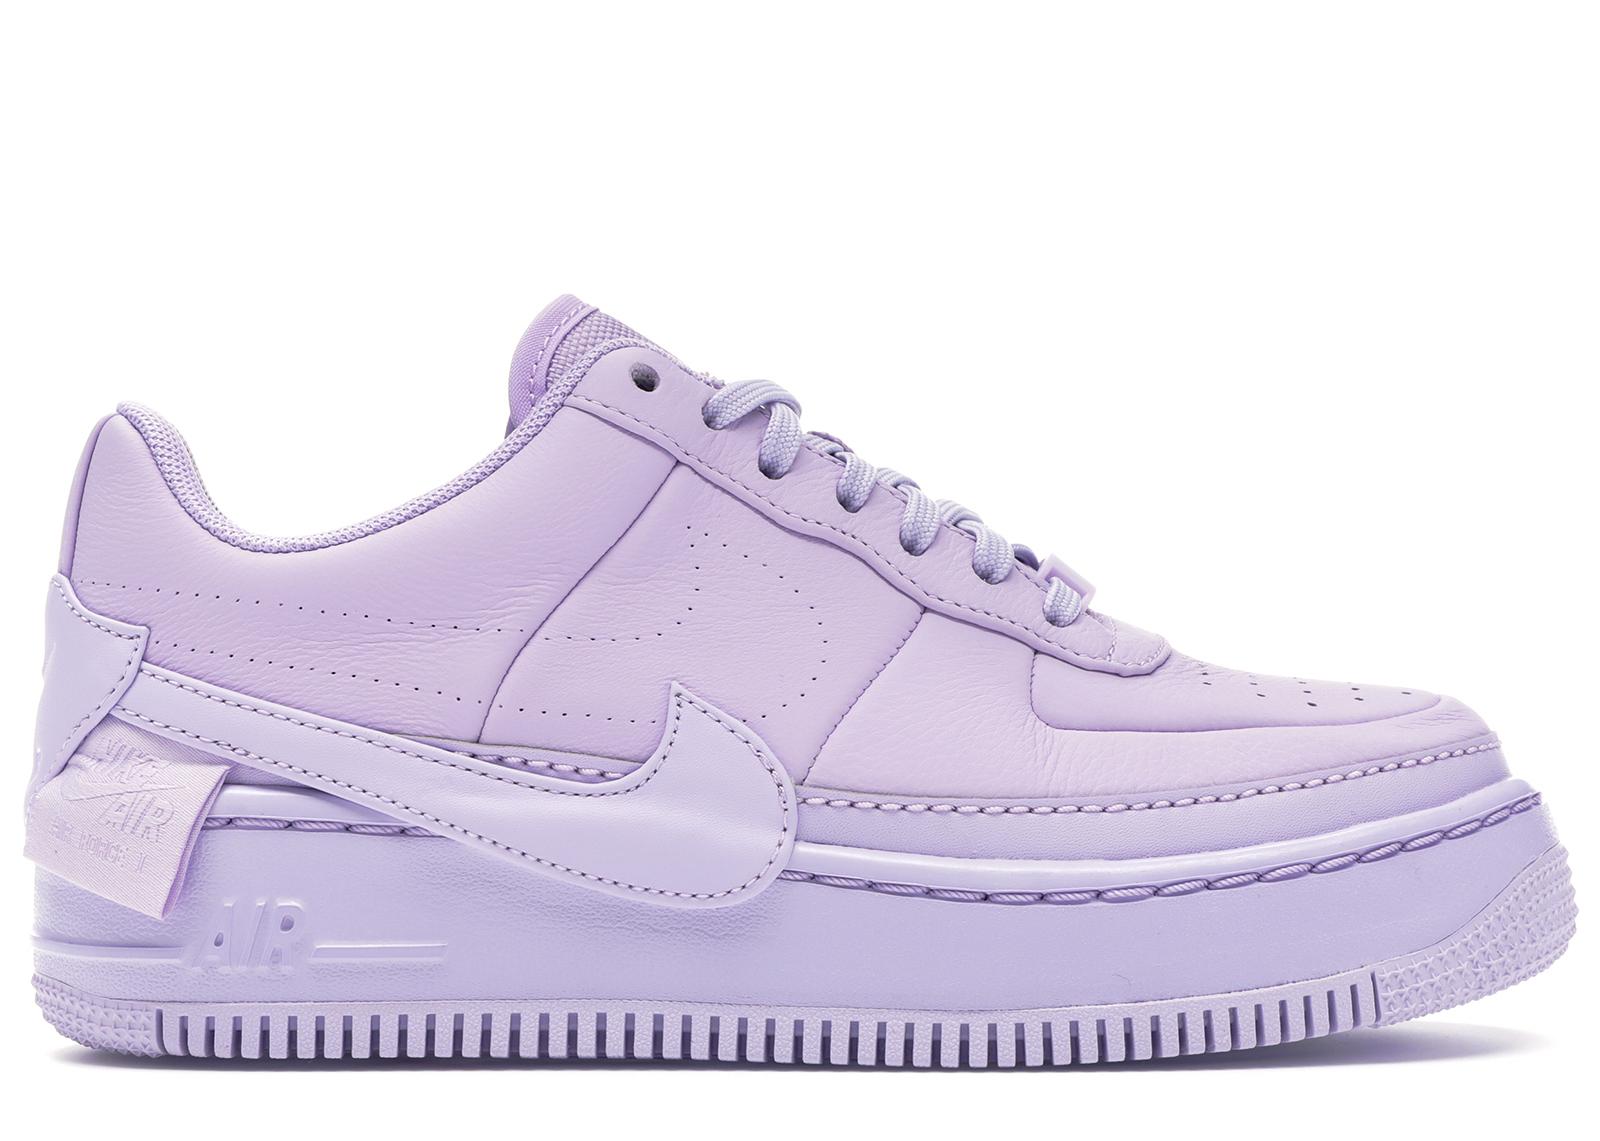 Nike Air Force 1 Jester XX Violet Mist (W)